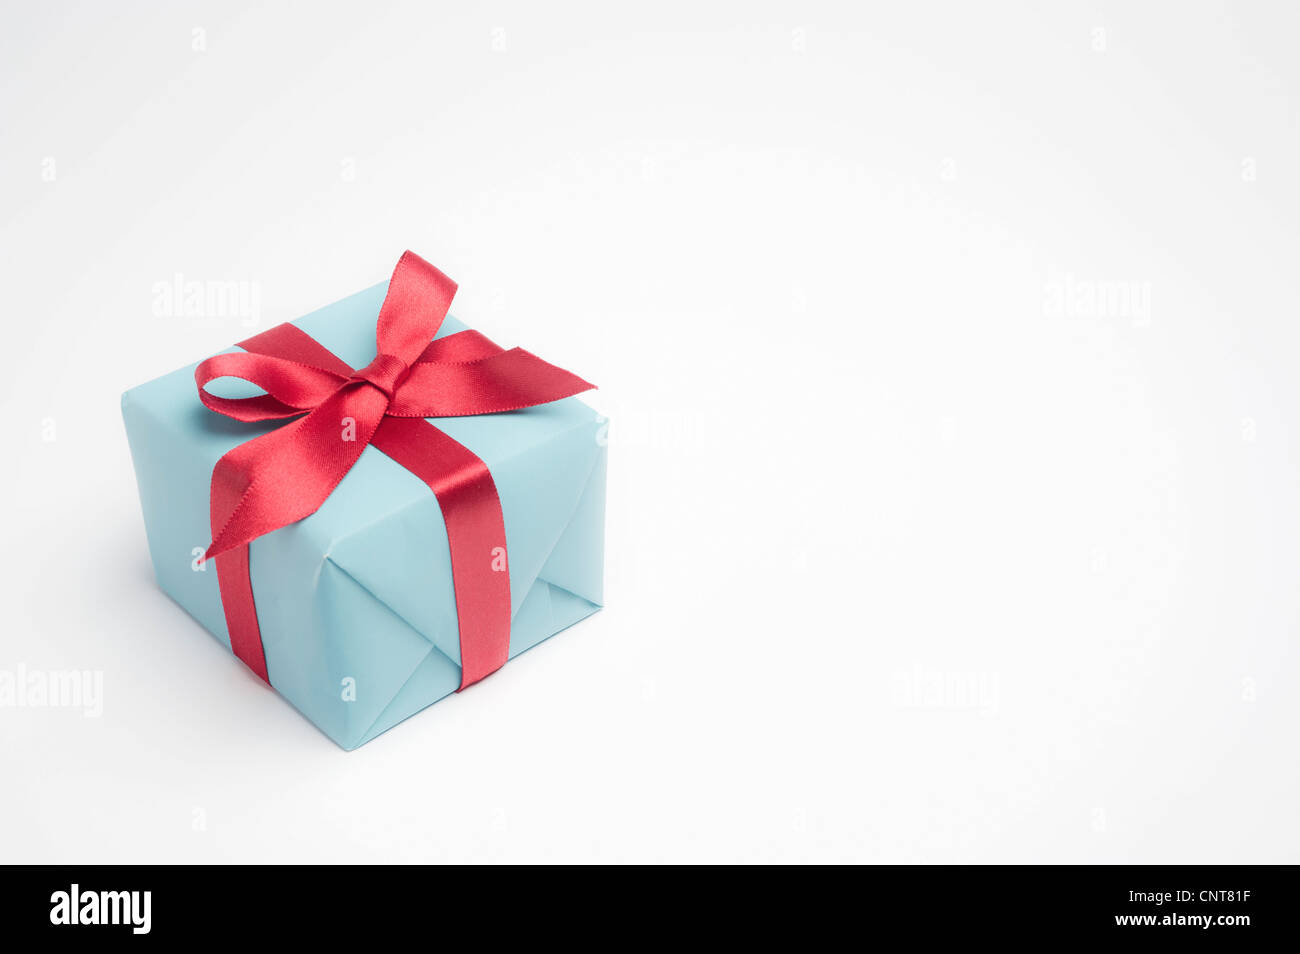 Gift Wrapped festivamente Imagen De Stock